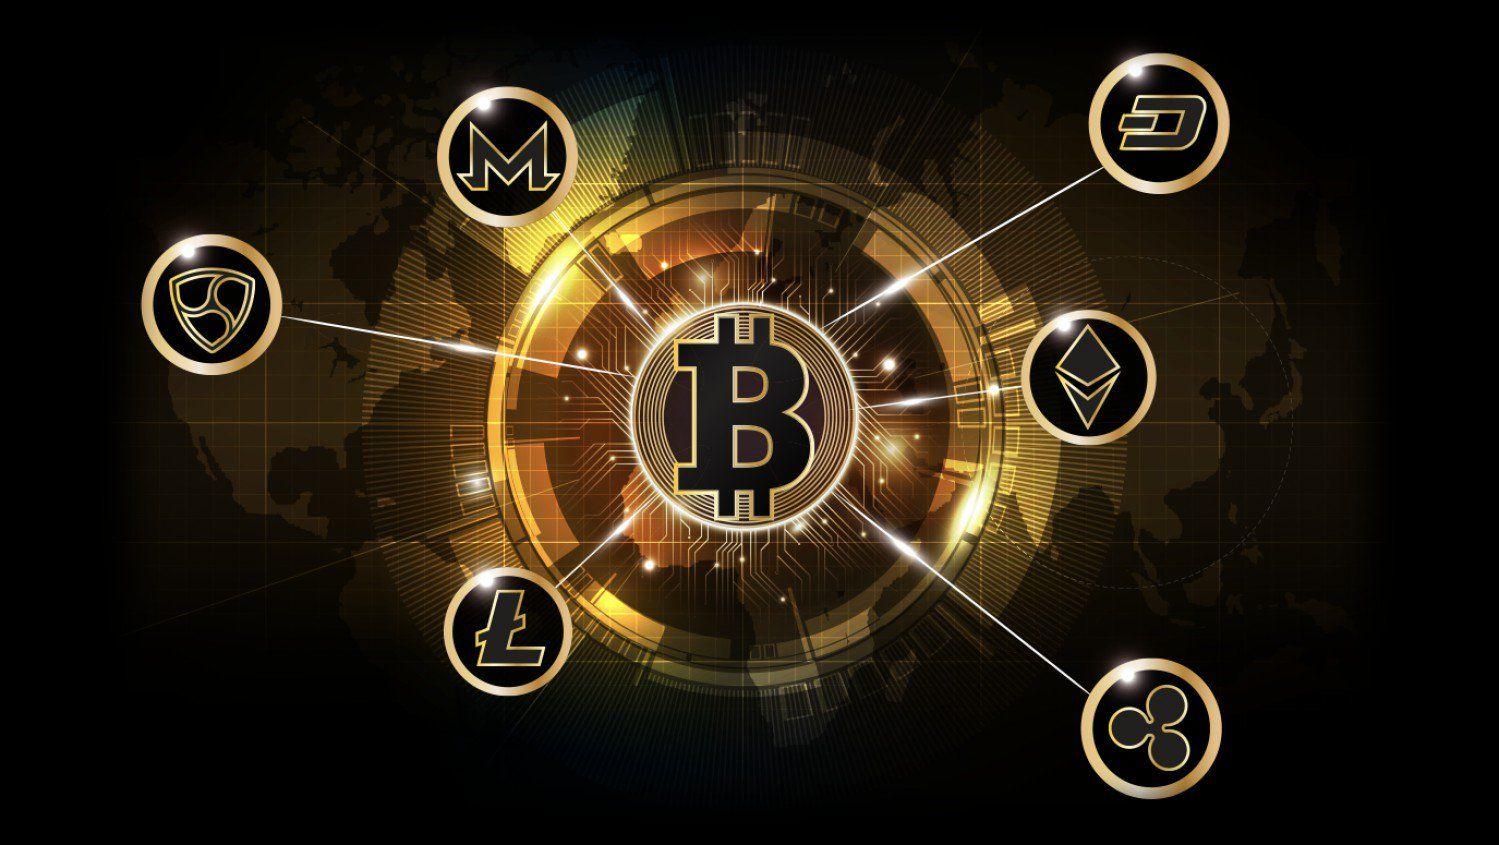 bitcoin gratis rapido wie kann ich tag bitcoin handeln